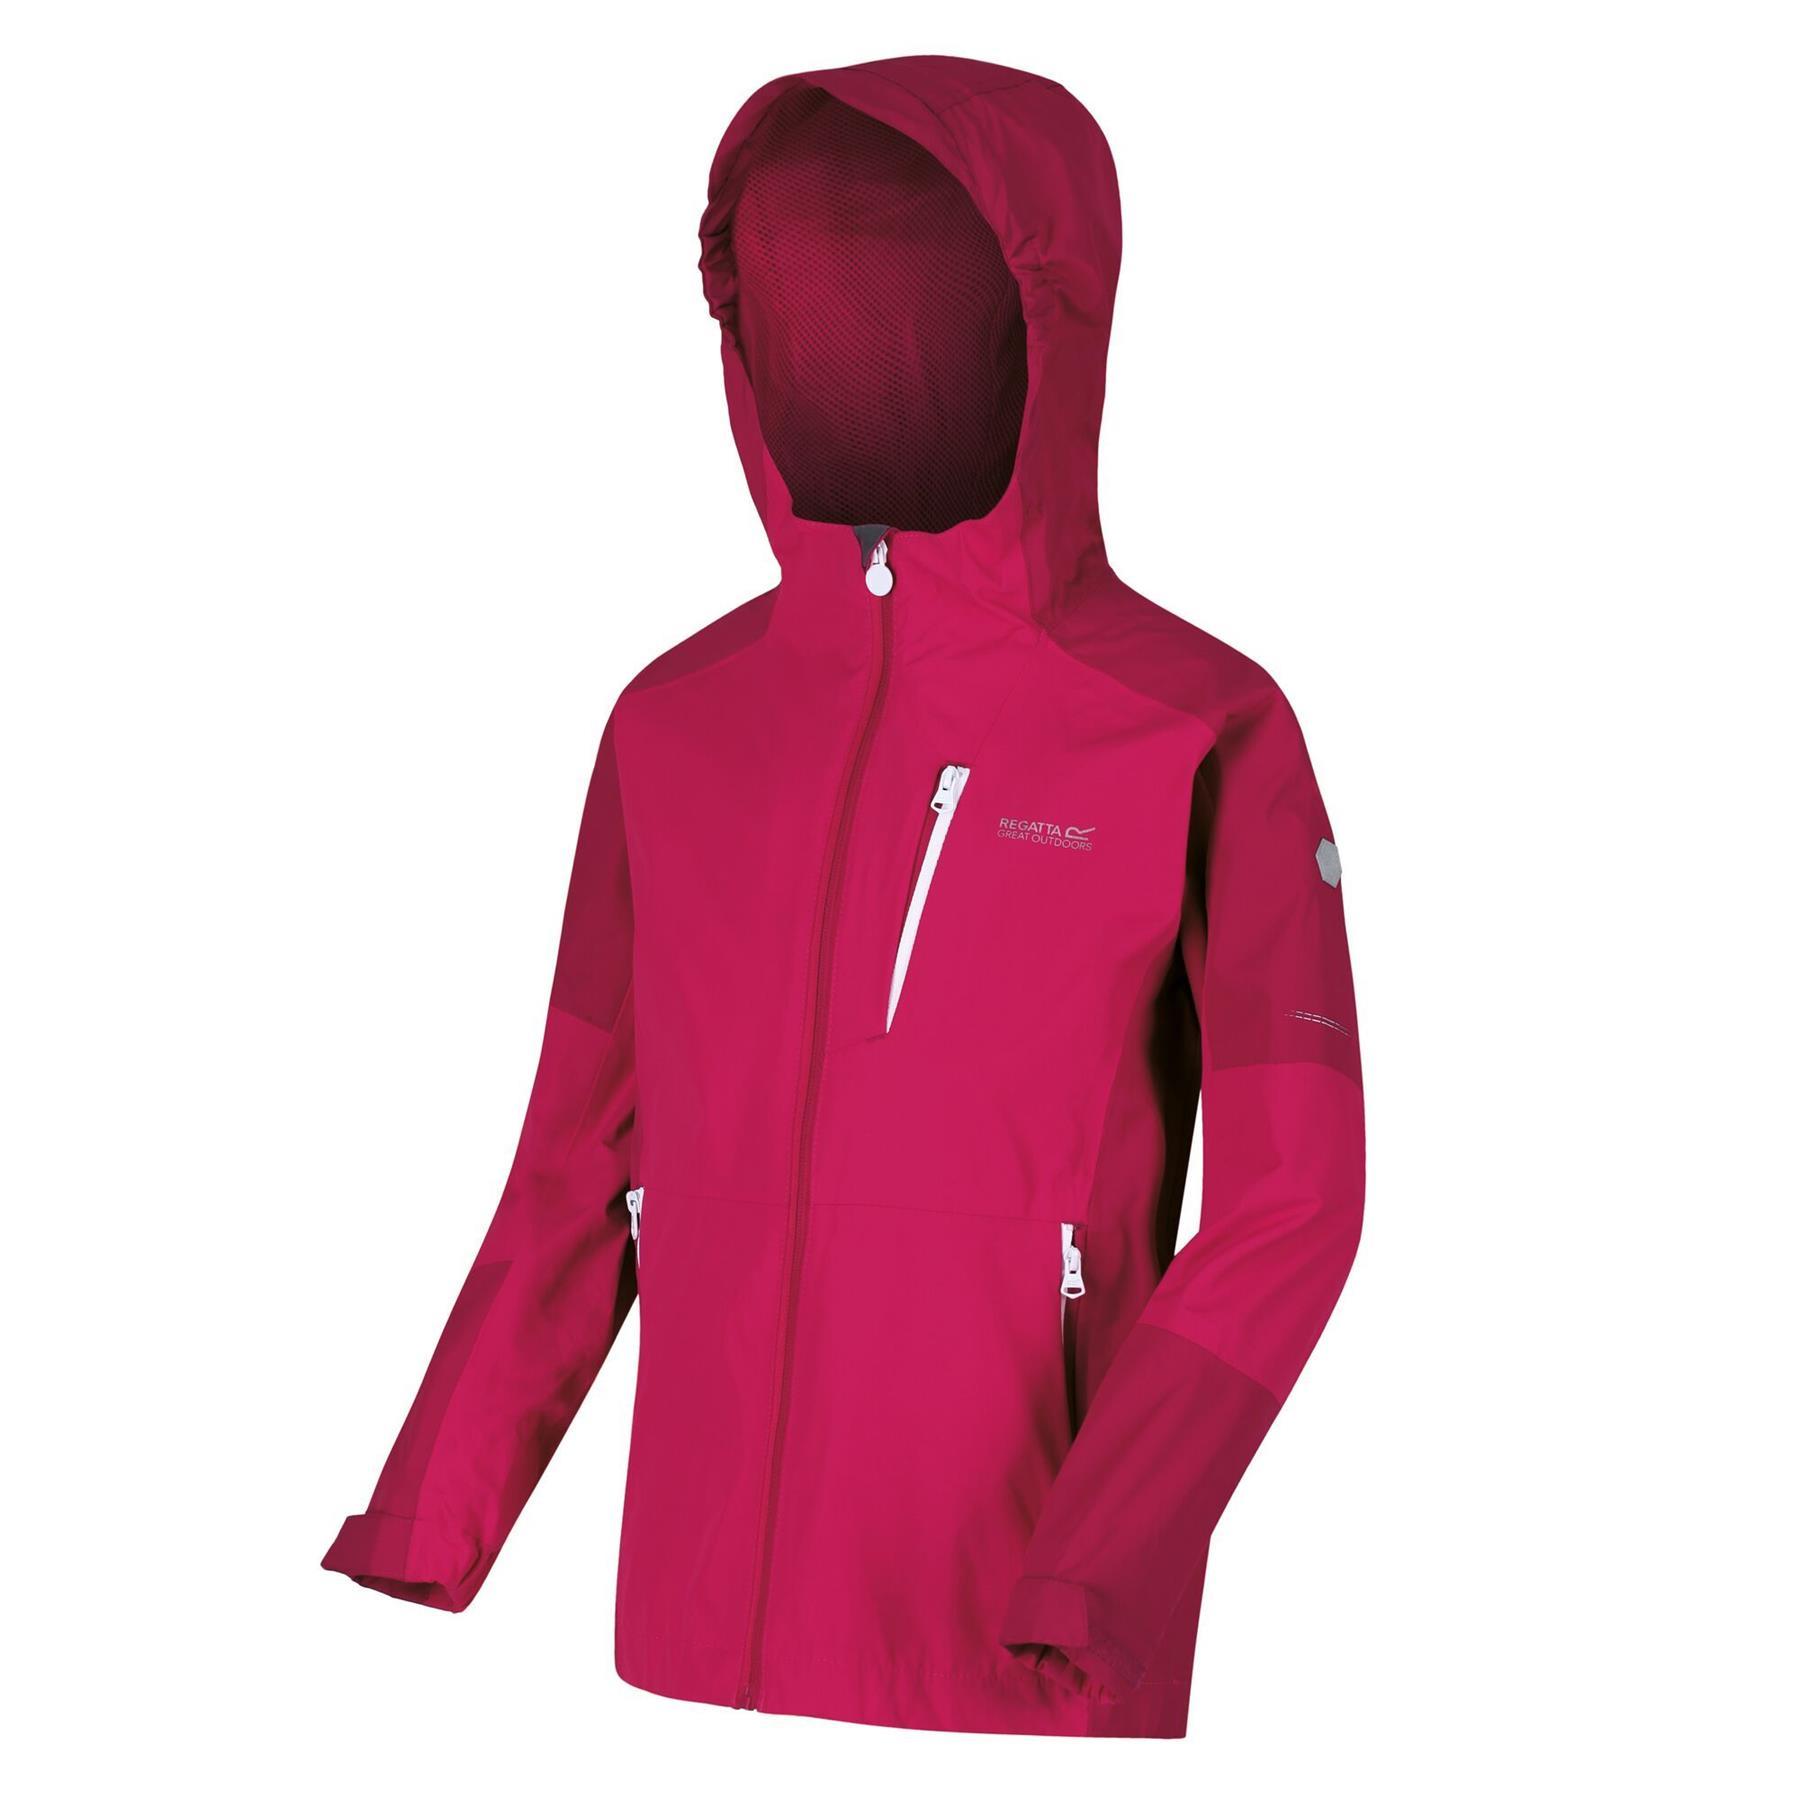 miniatuur 5 - Regatta Kids Calderdale II Waterproof Hooded Zip Pocket Jacket Boy Girls Coat